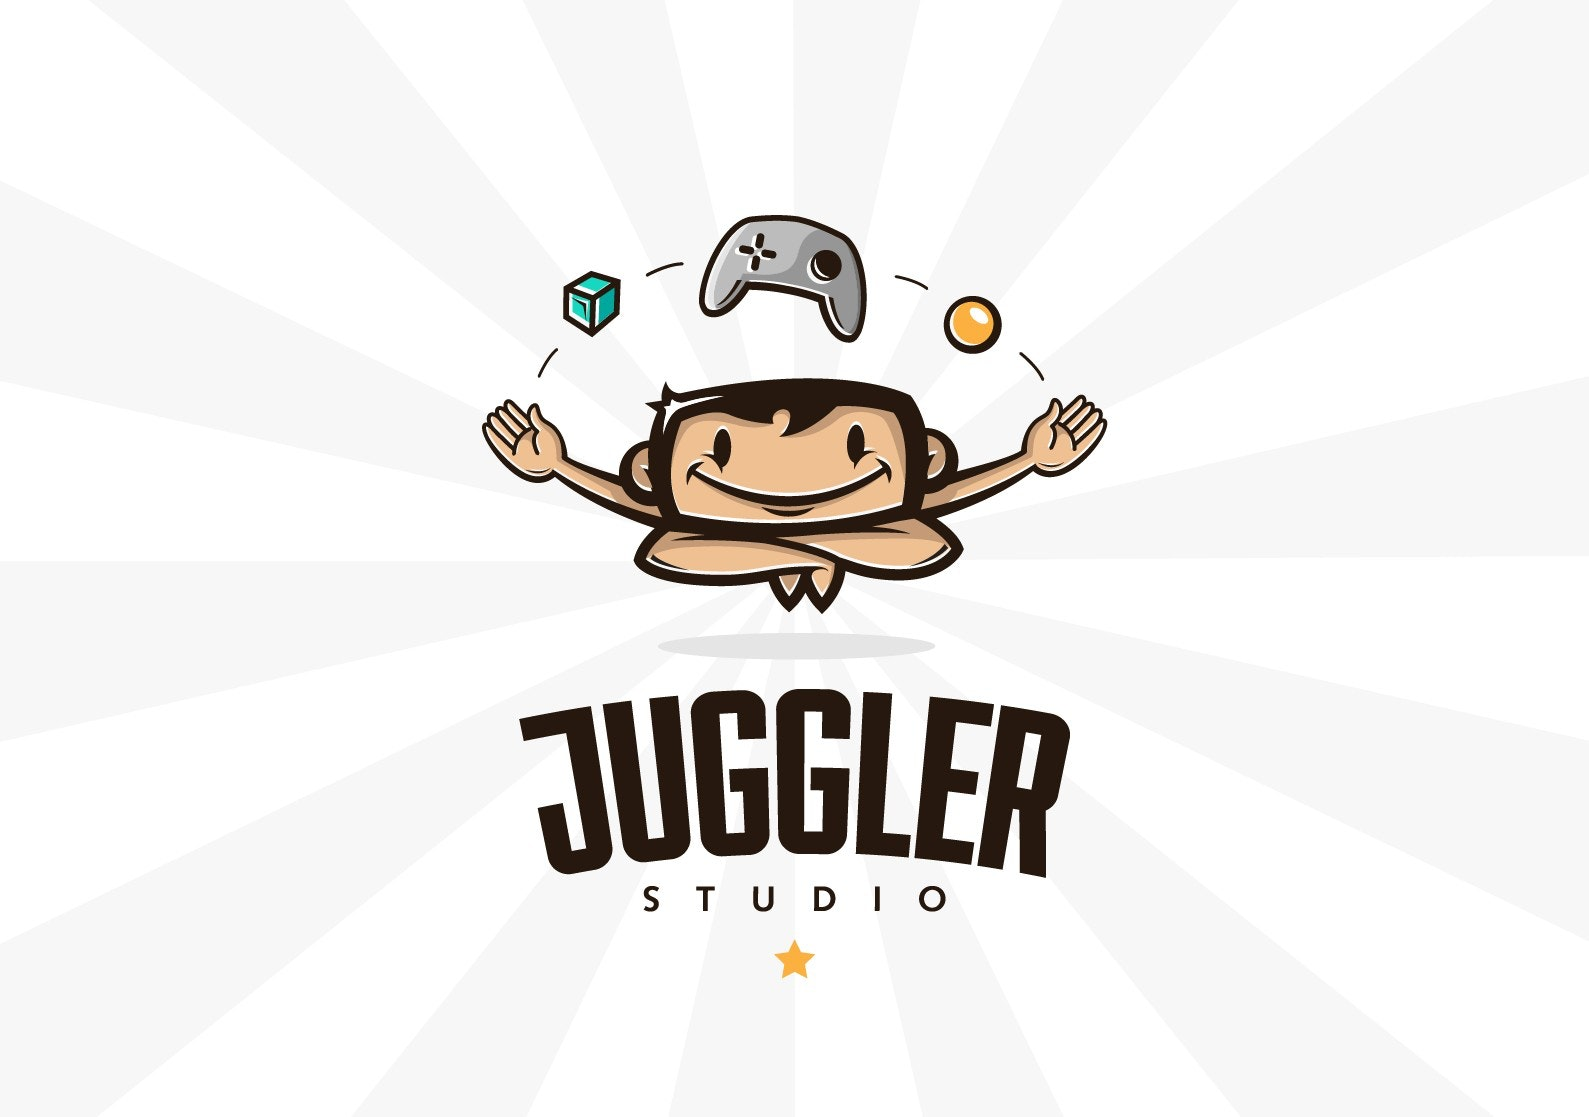 Juggler logo